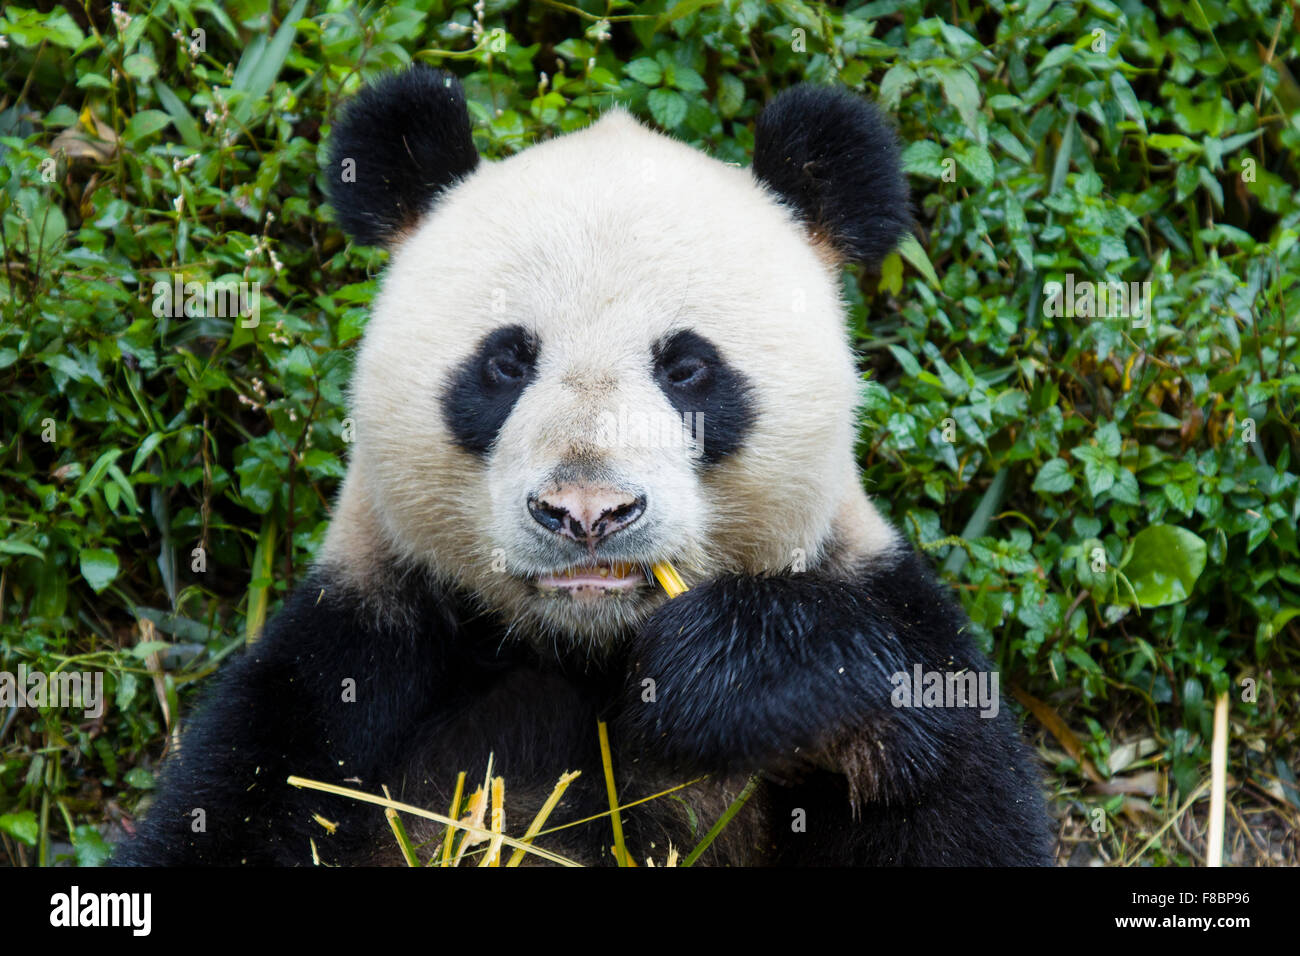 Panda Ailuropoda melanoleuca Bifengxia Panda Base Sichuan Province China MA003069 - Stock Image